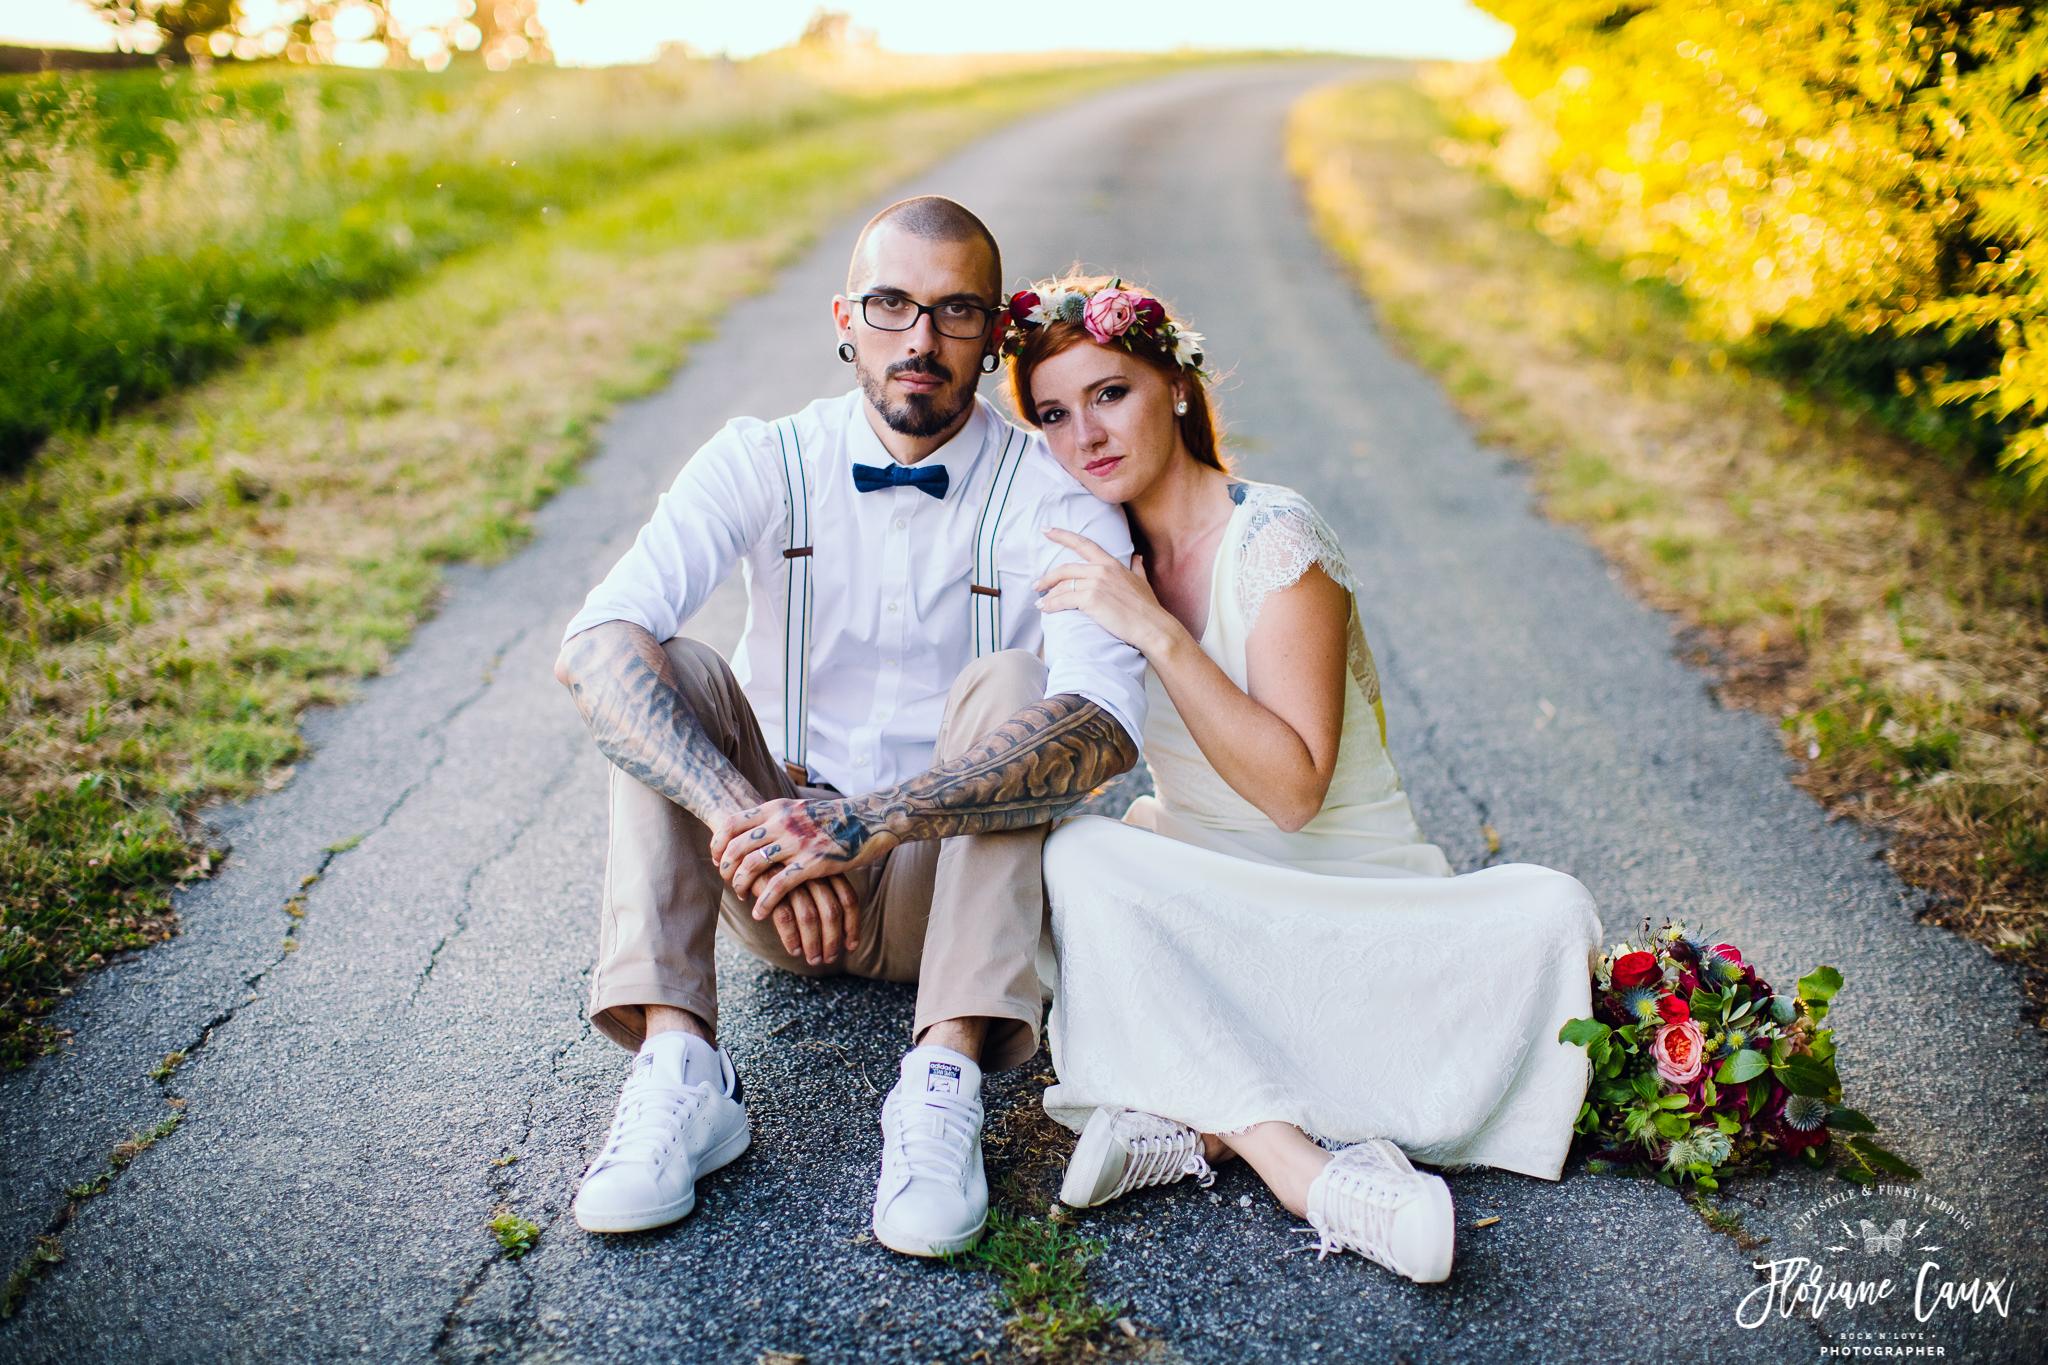 photographe-mariage-toulouse-rocknroll-maries-tatoues-floriane-caux-70